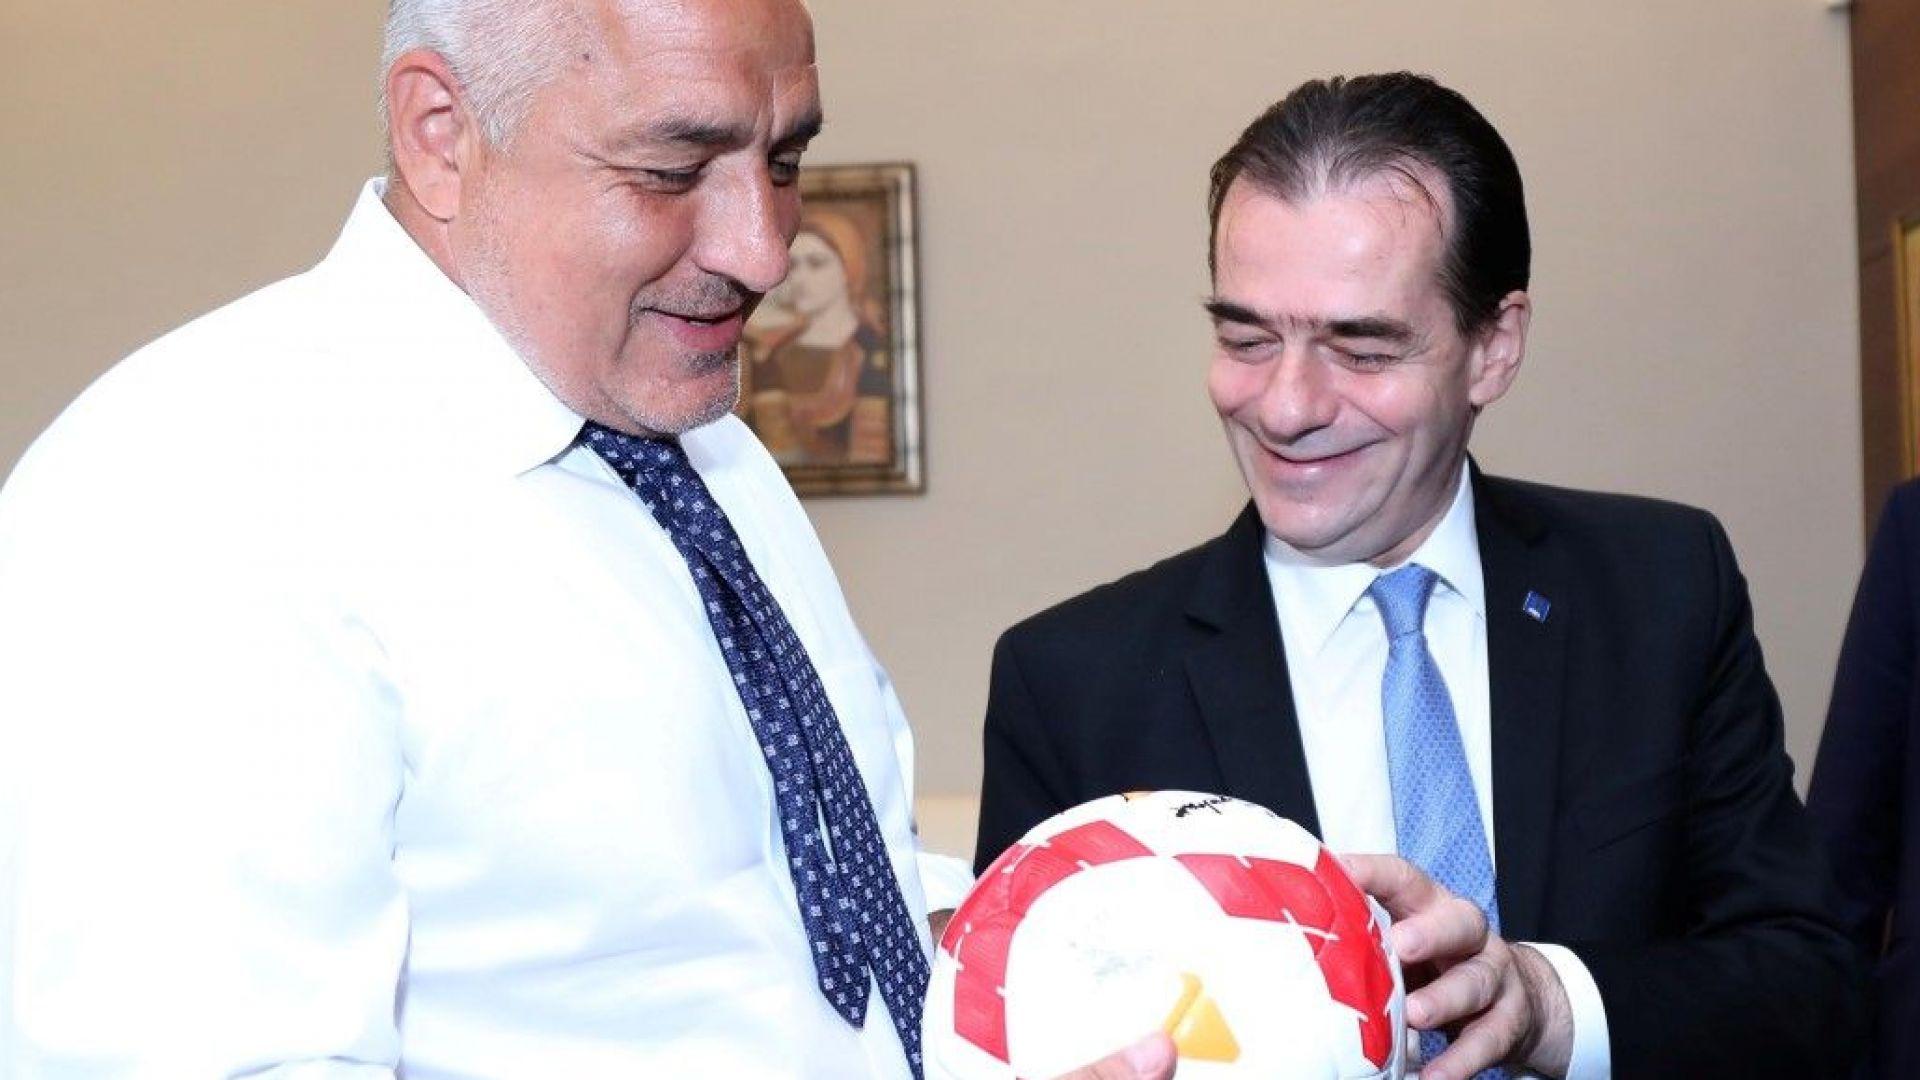 Борисов получи от румънски партиен лидер топка с автограф от Георге Хаджи